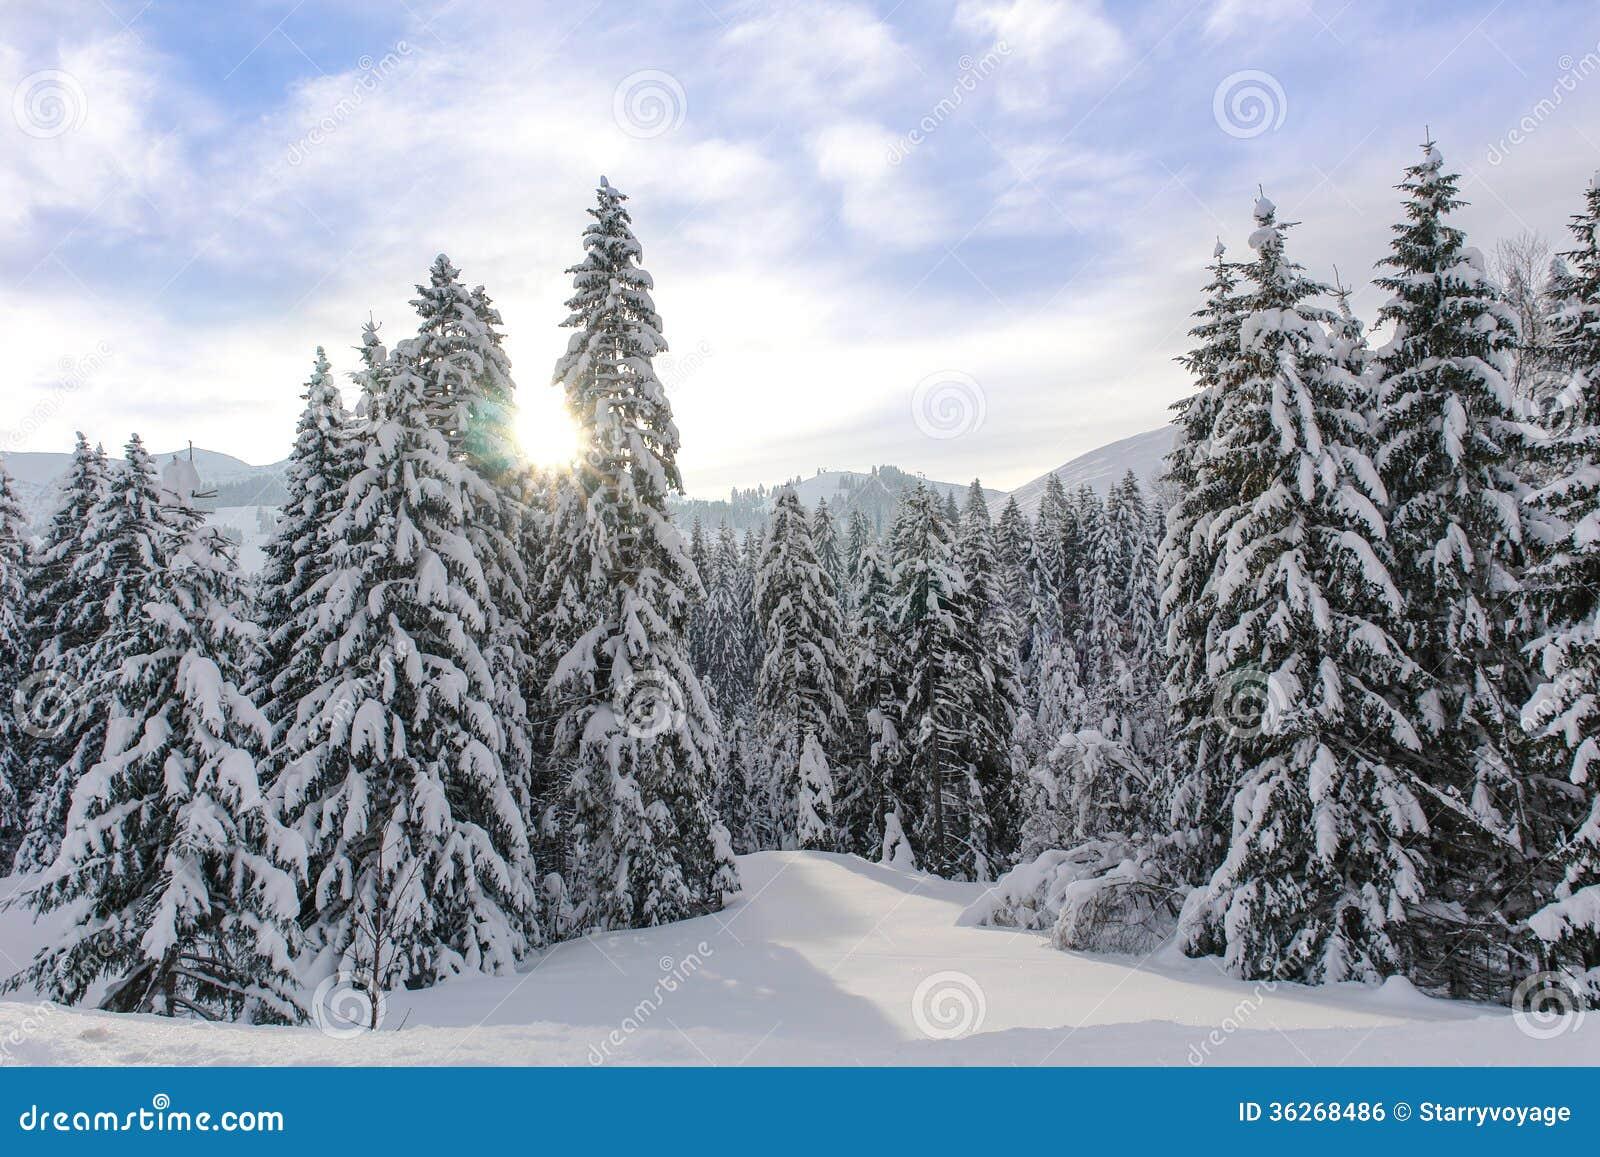 Snowy Alpine Trees Xi Stock Photo Image Of Mountain 36268486